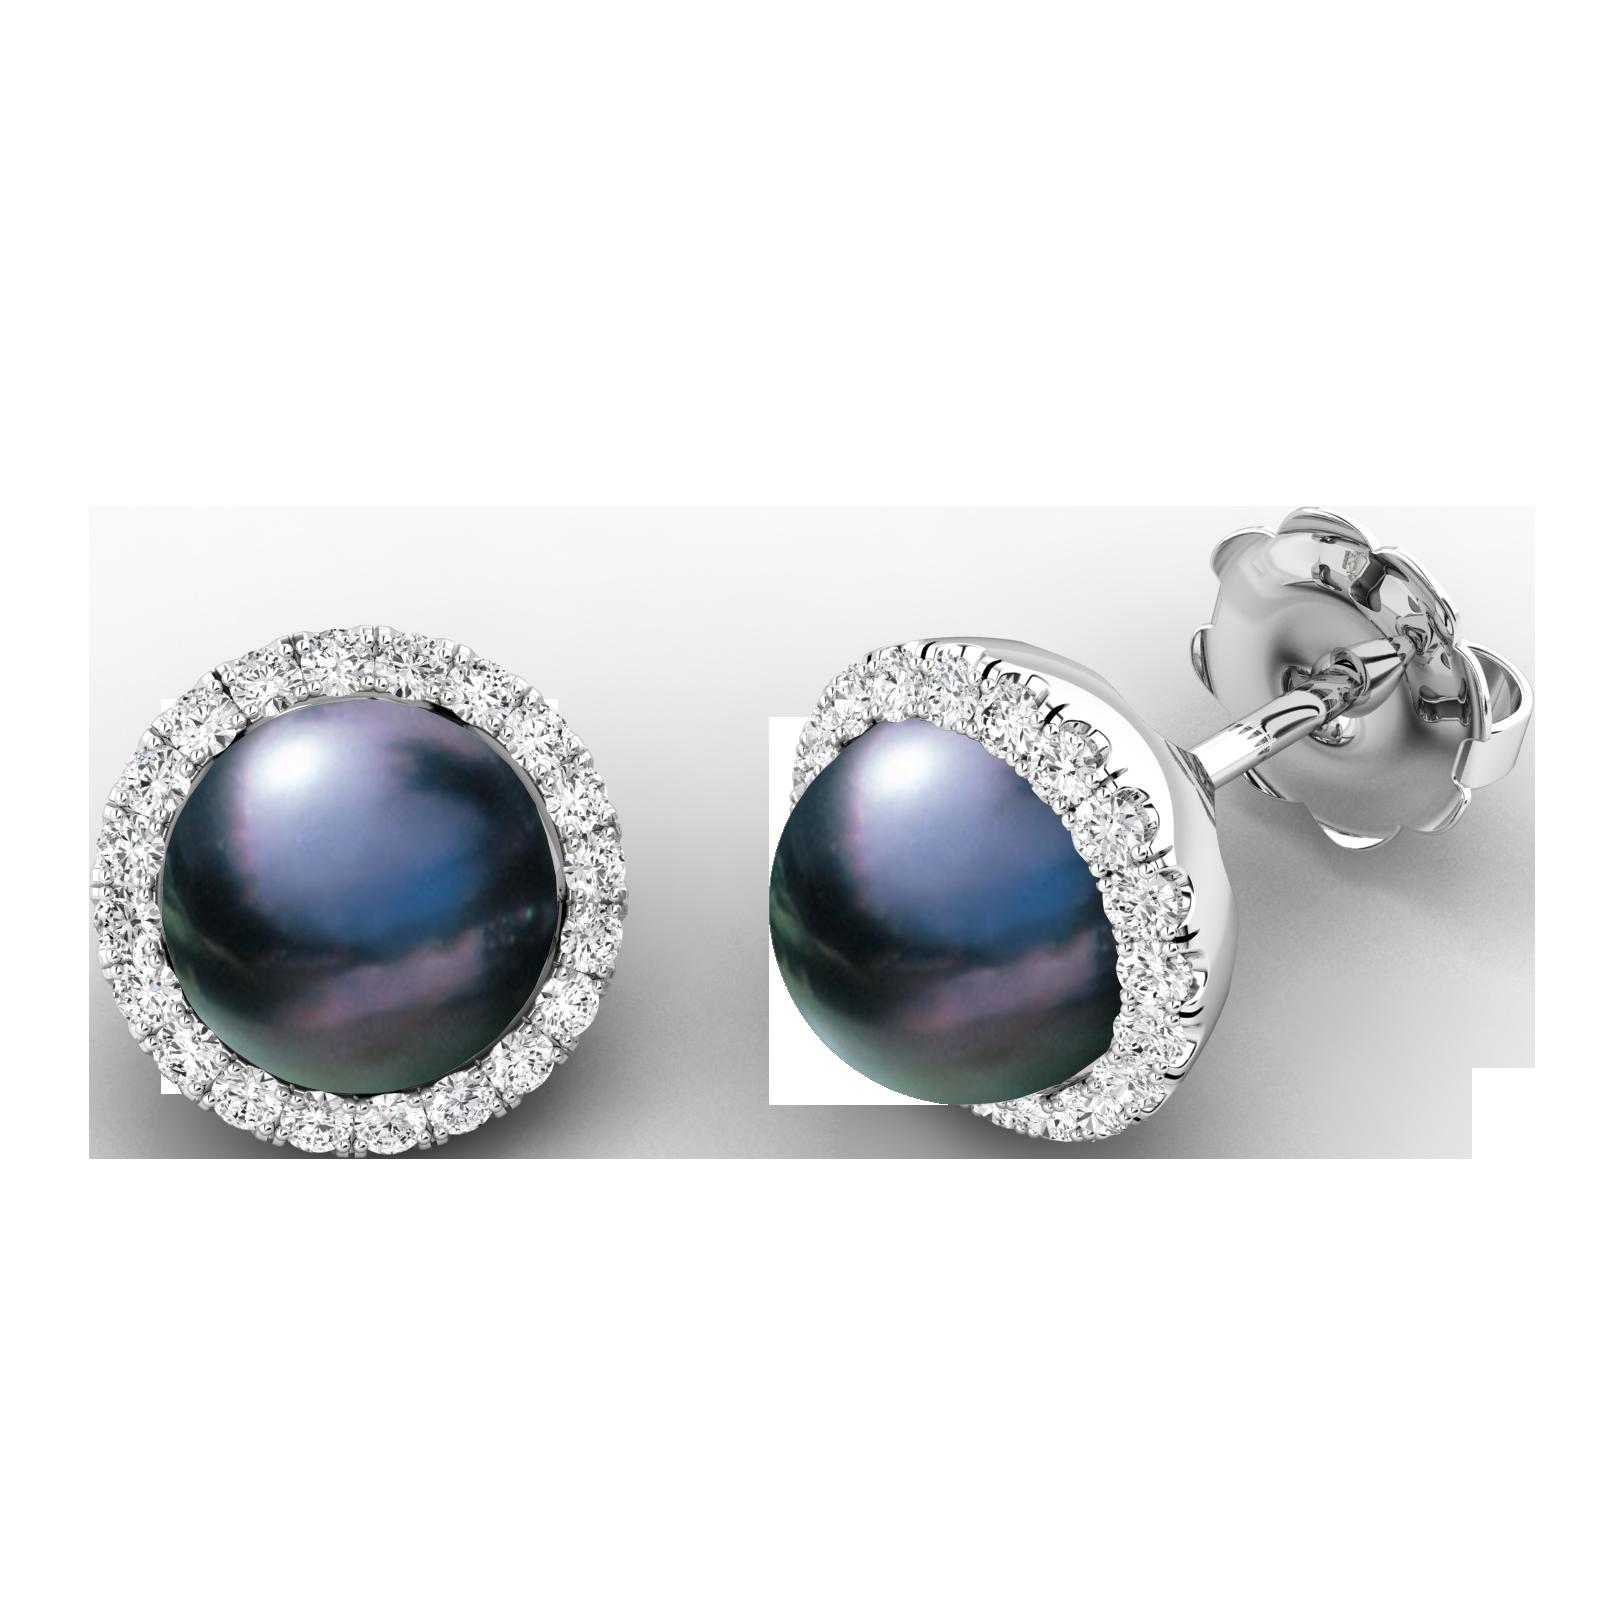 Cercei Stud Aur Alb 18kt cu Perle Negre si Diamante Rotunde Briliant-img1